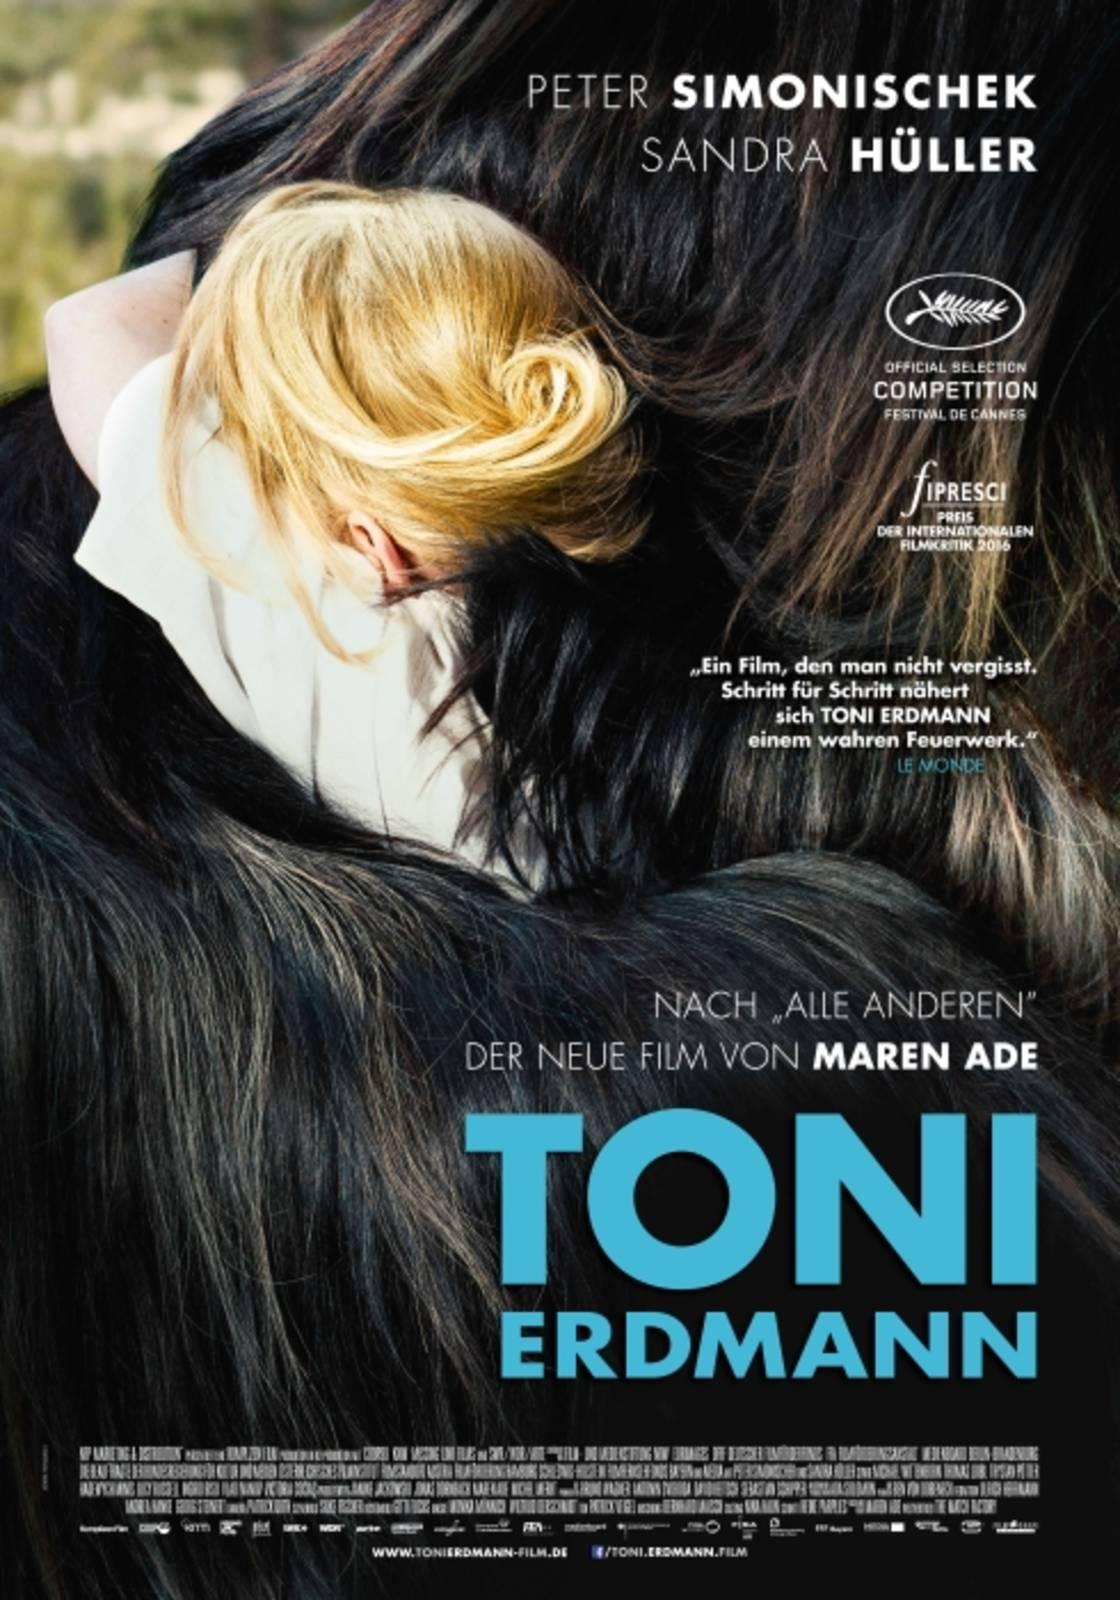 Alle Anderen 2009 film toni erdmann - cineman